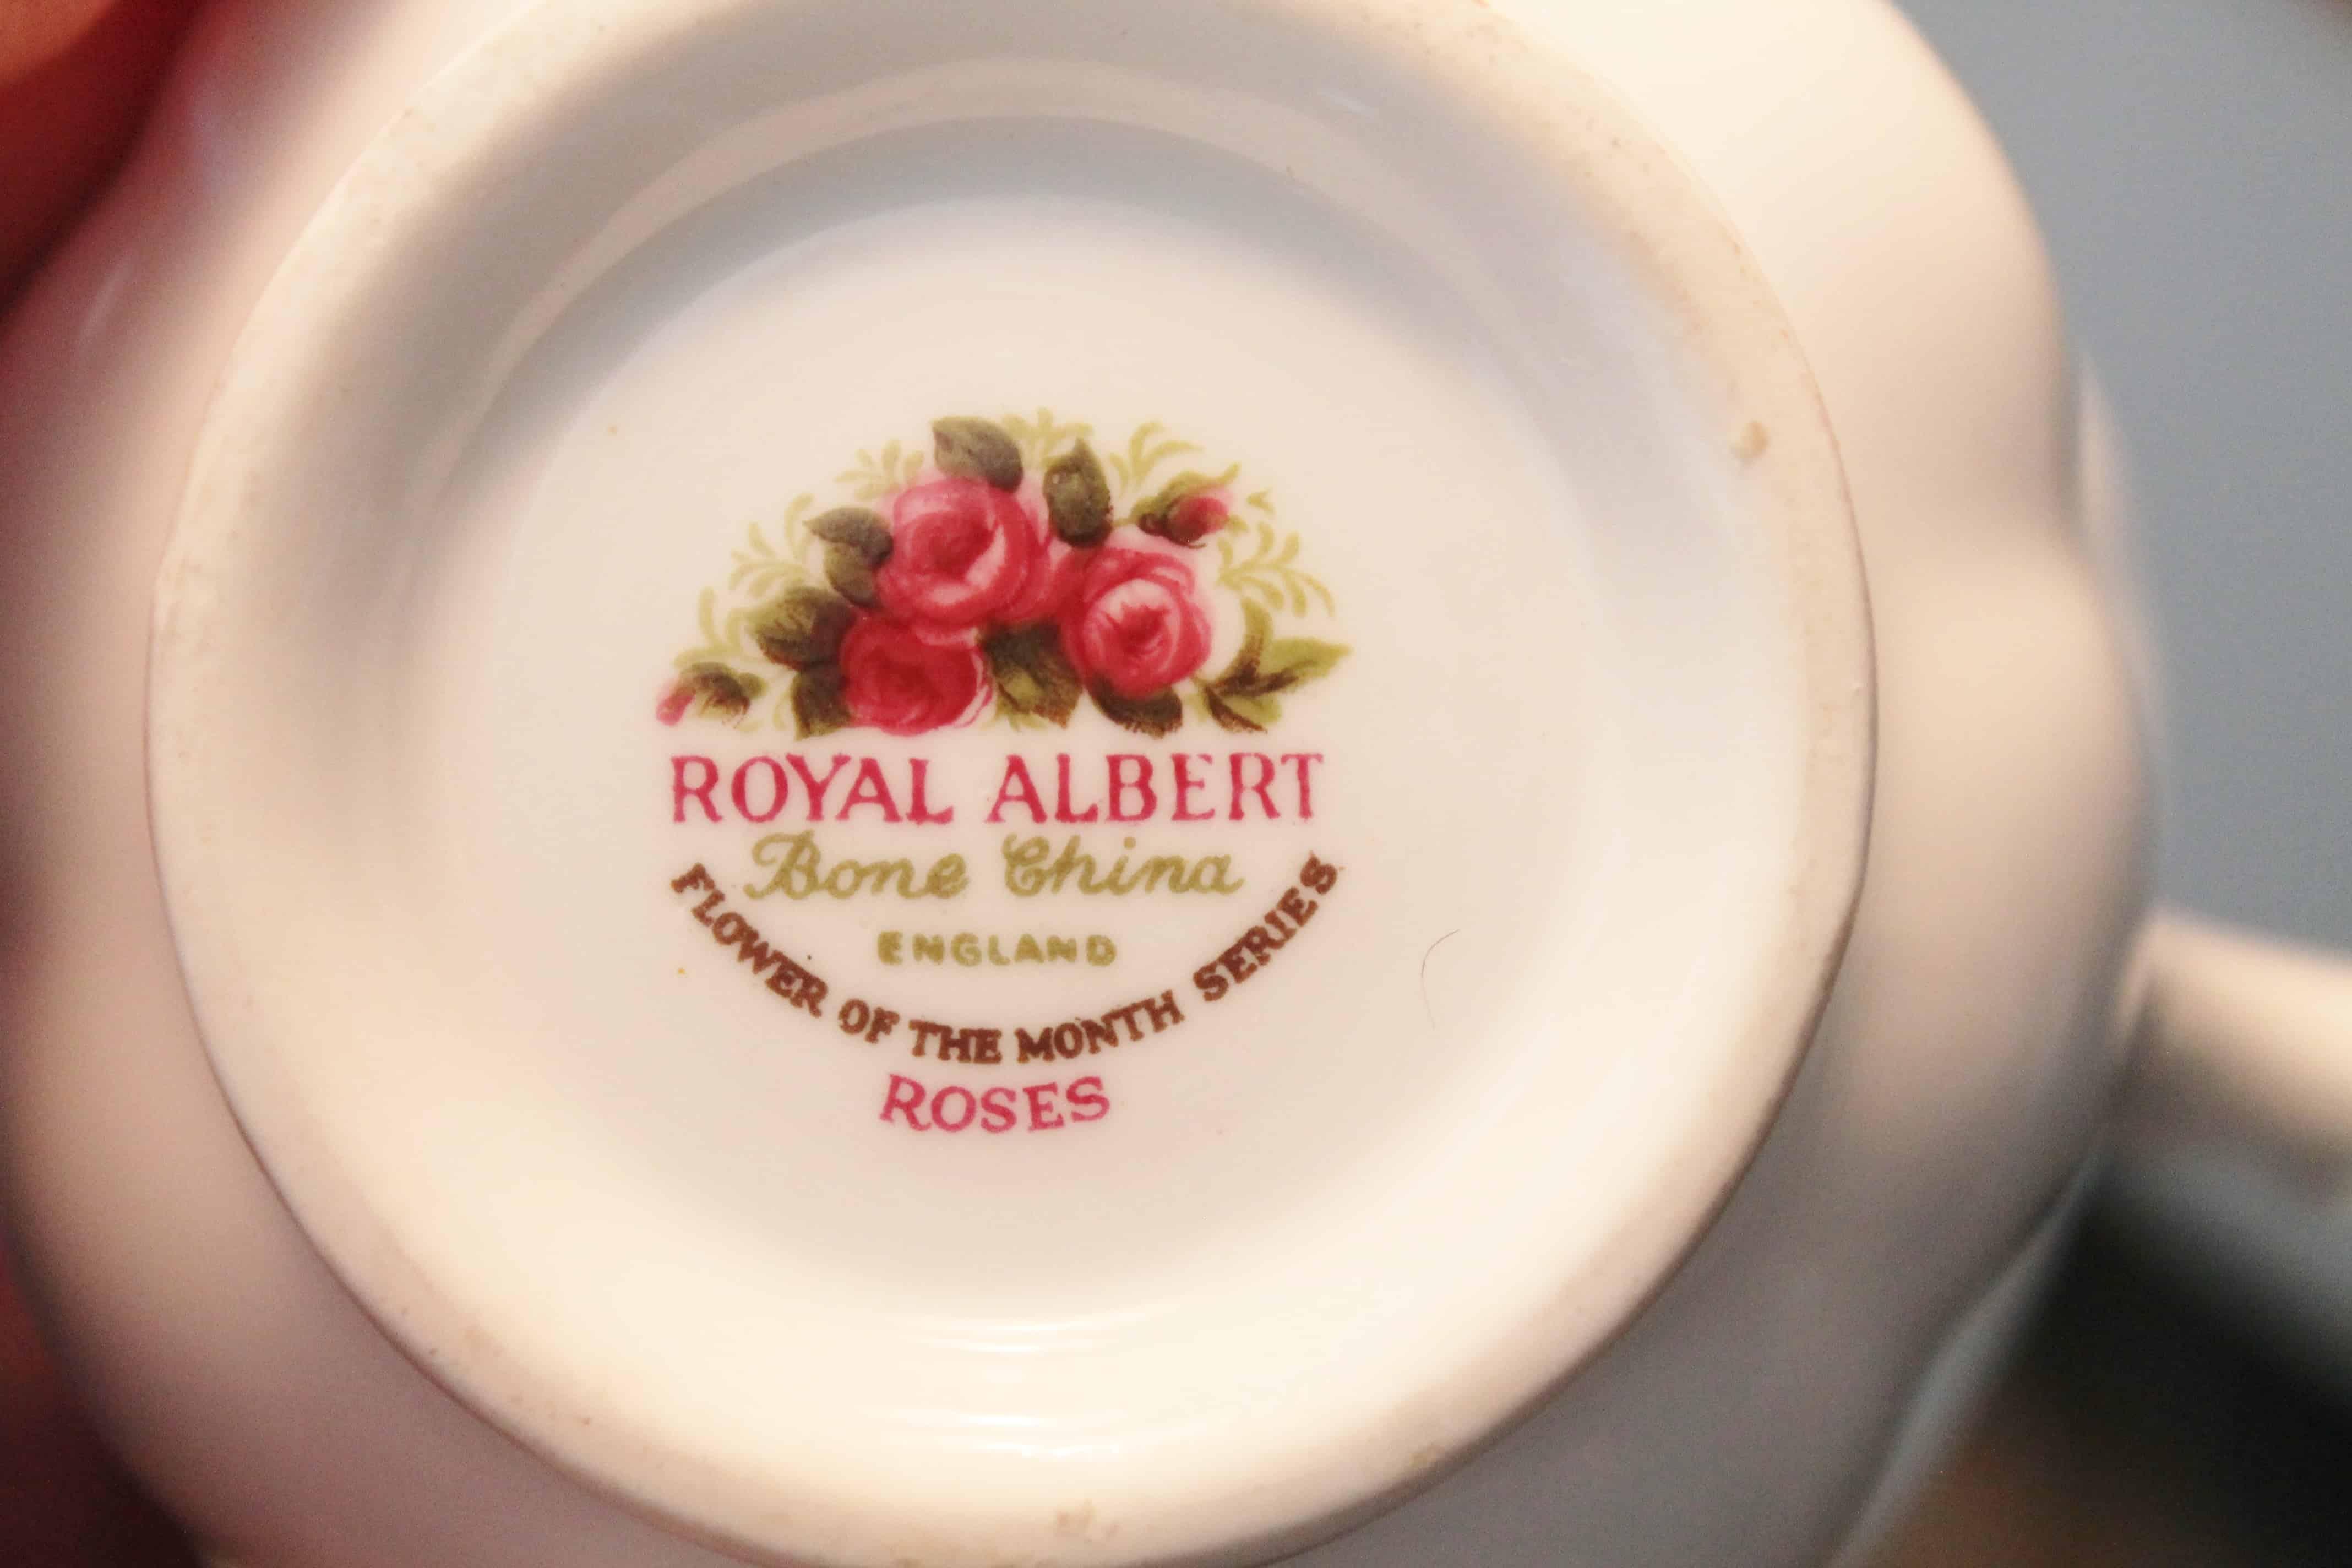 Royal Albert mark